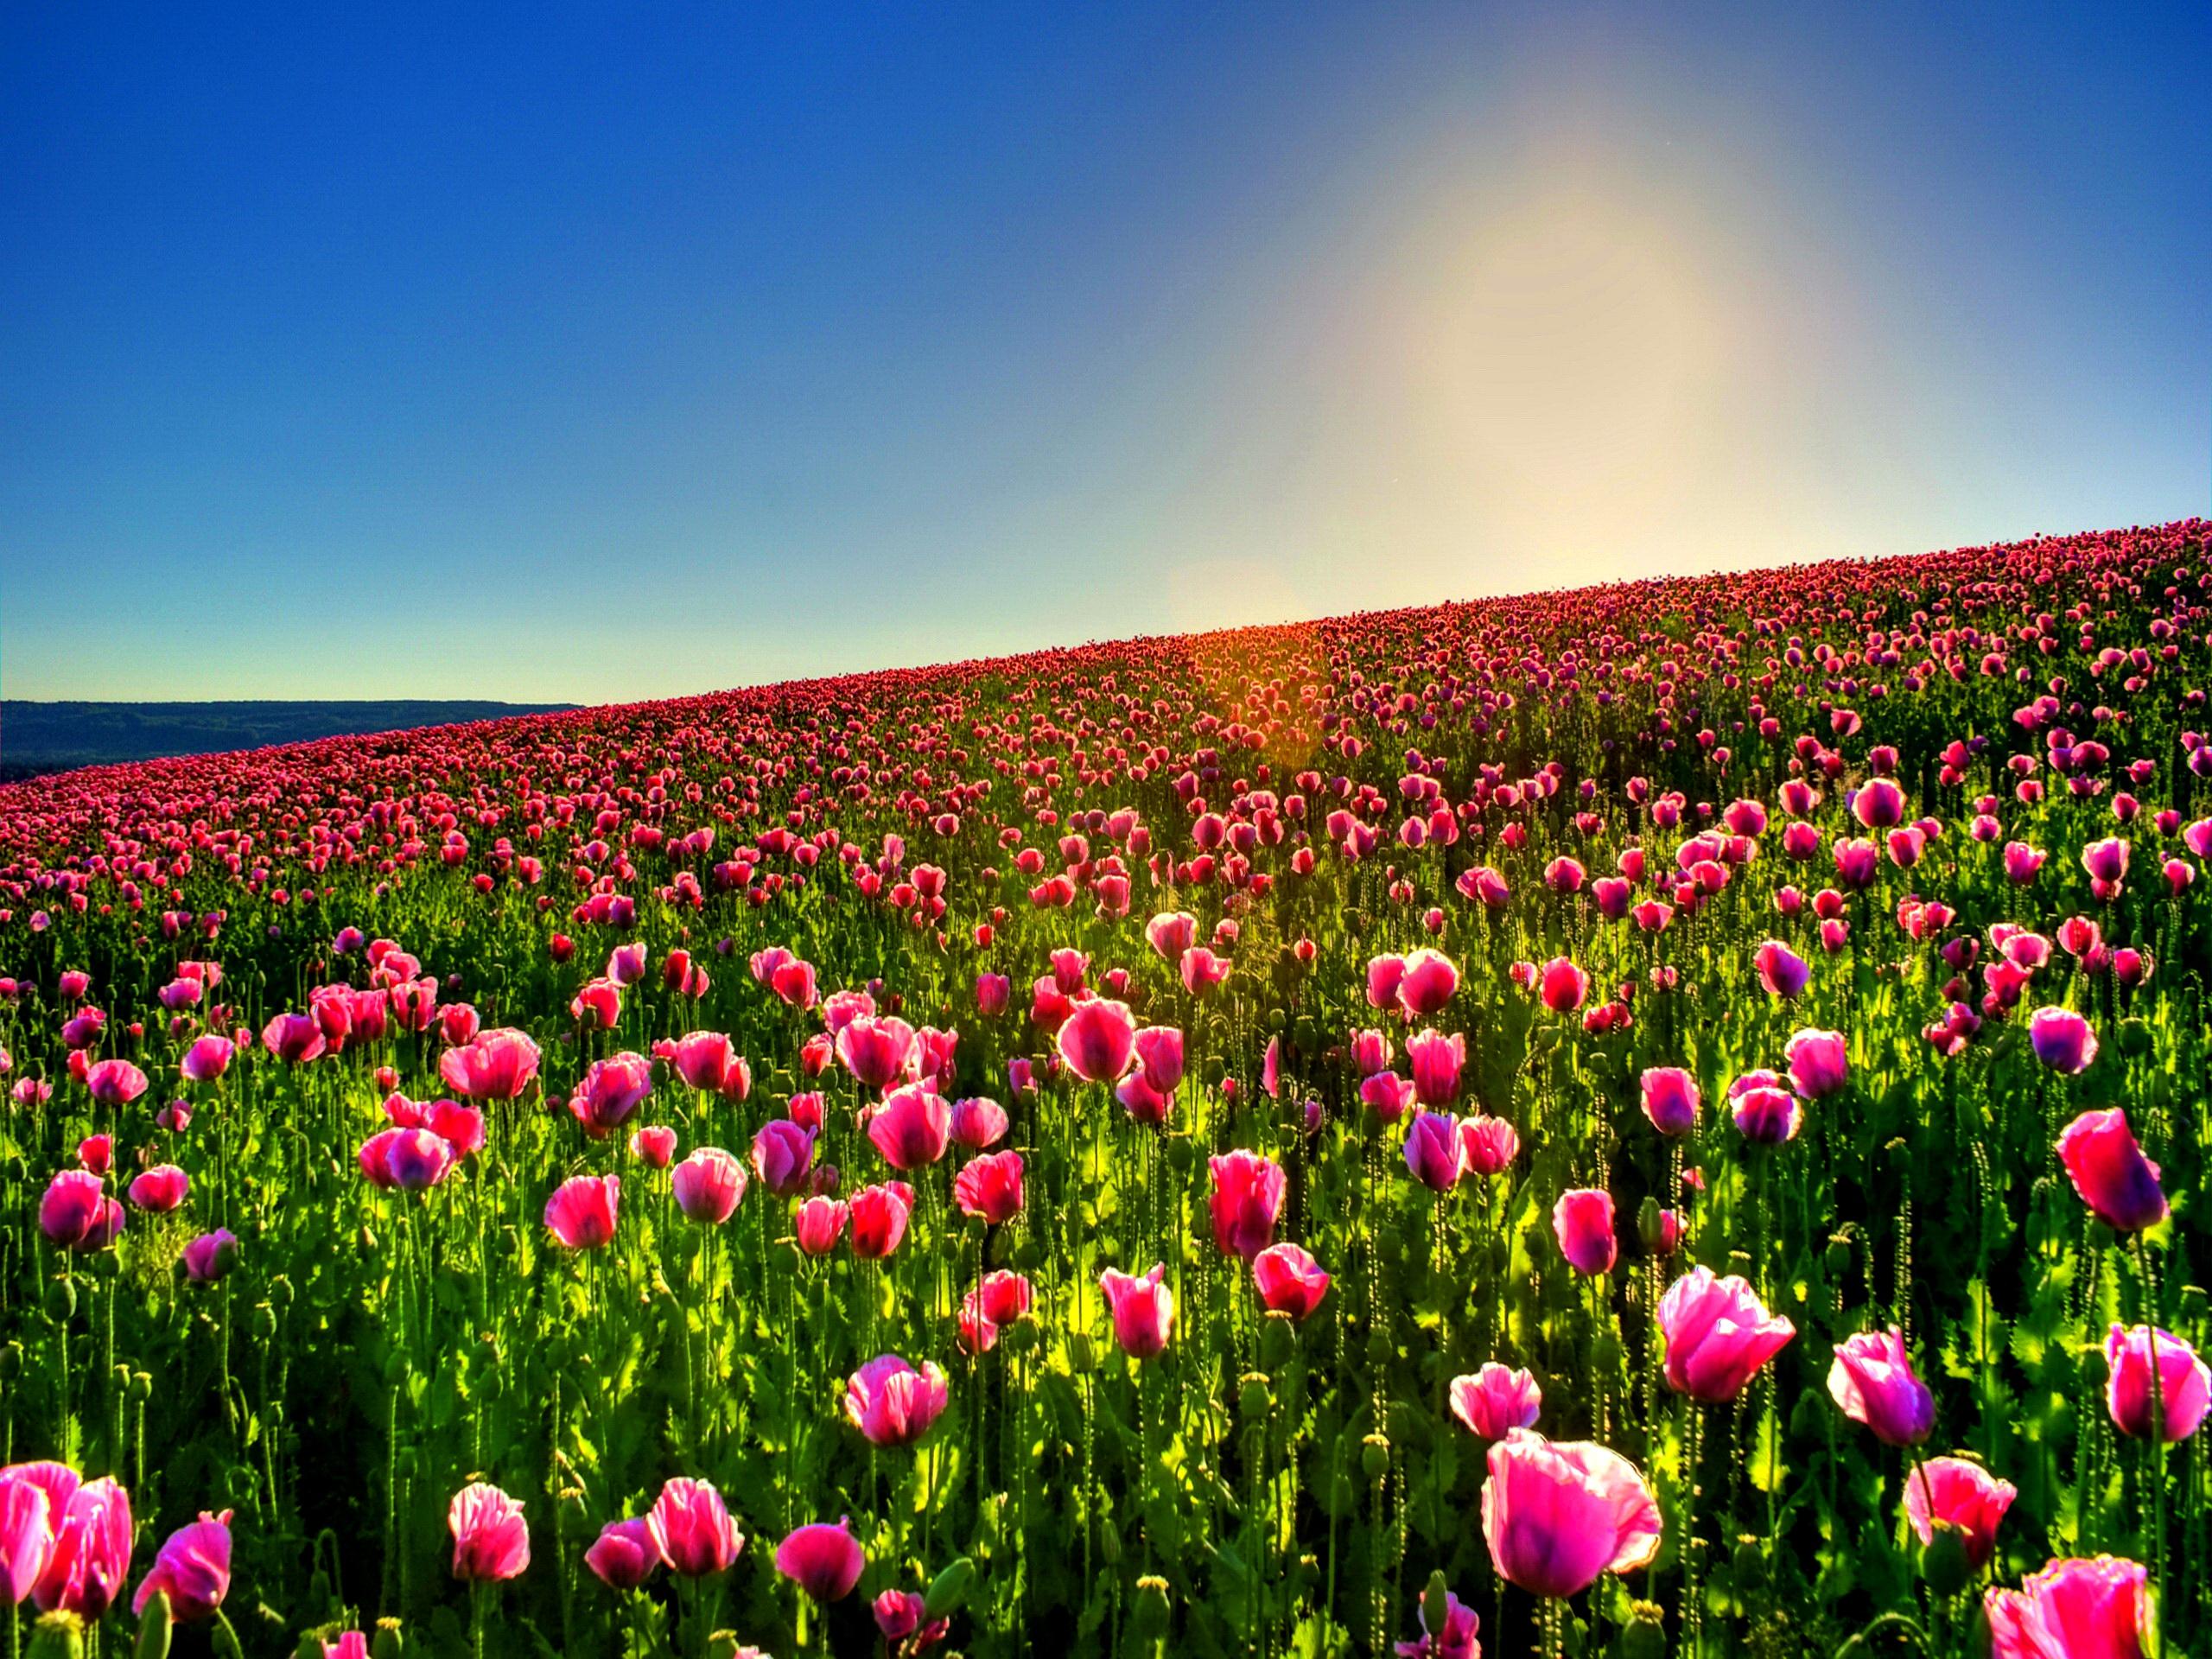 Lovely Tulip Field Wallpaper